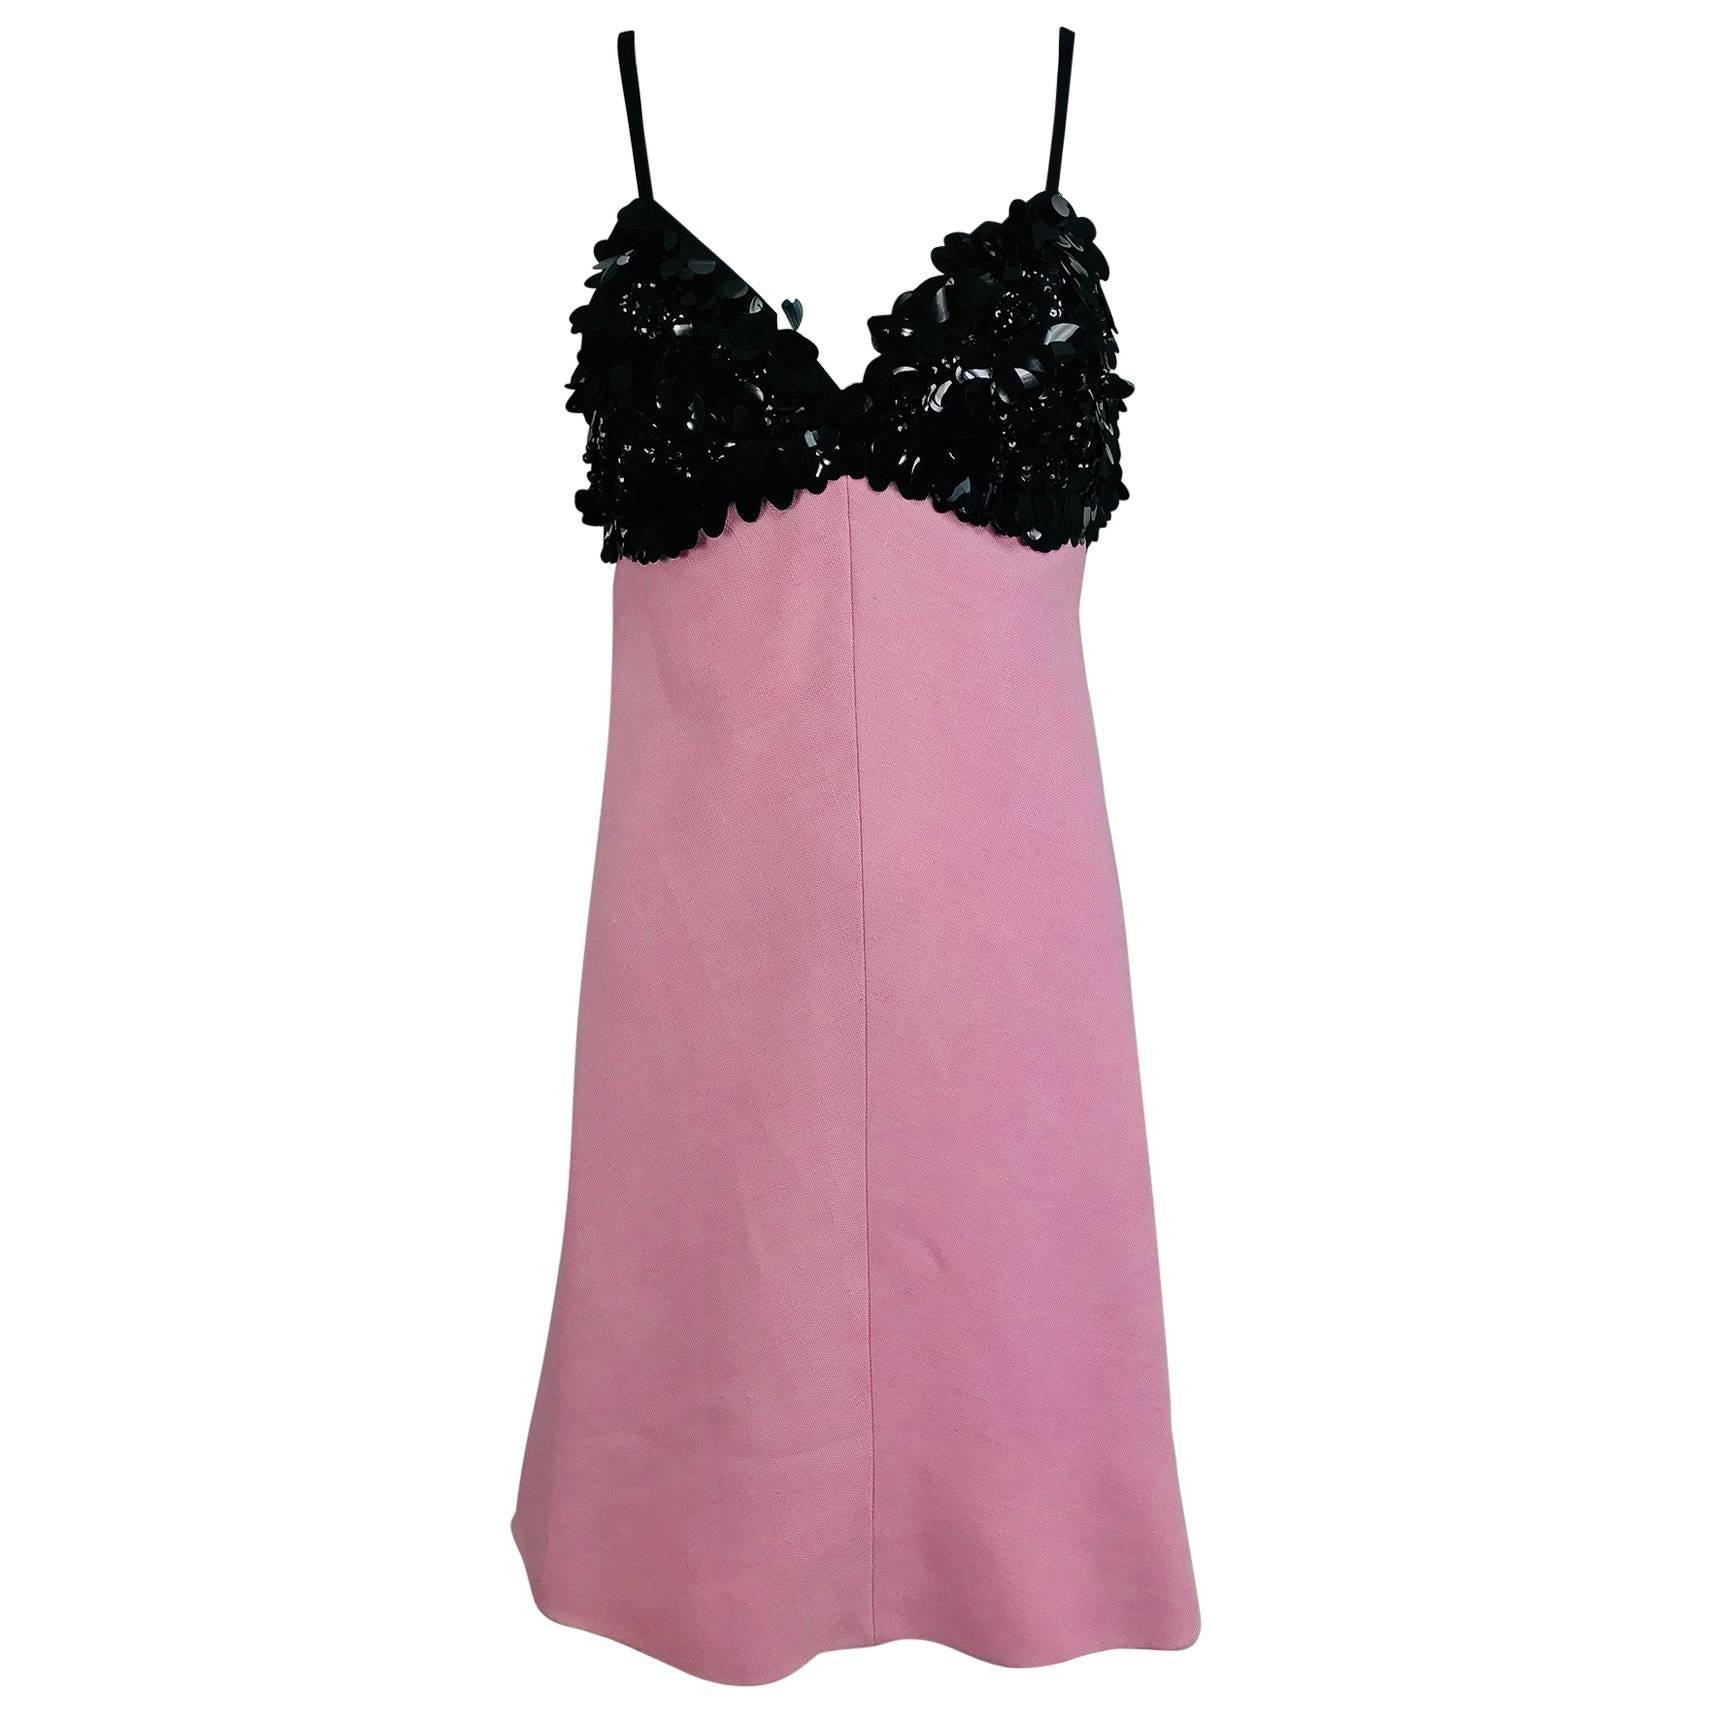 Junior Sophisticates Black Paillette and Pink Linen Dress and Coat 1960s